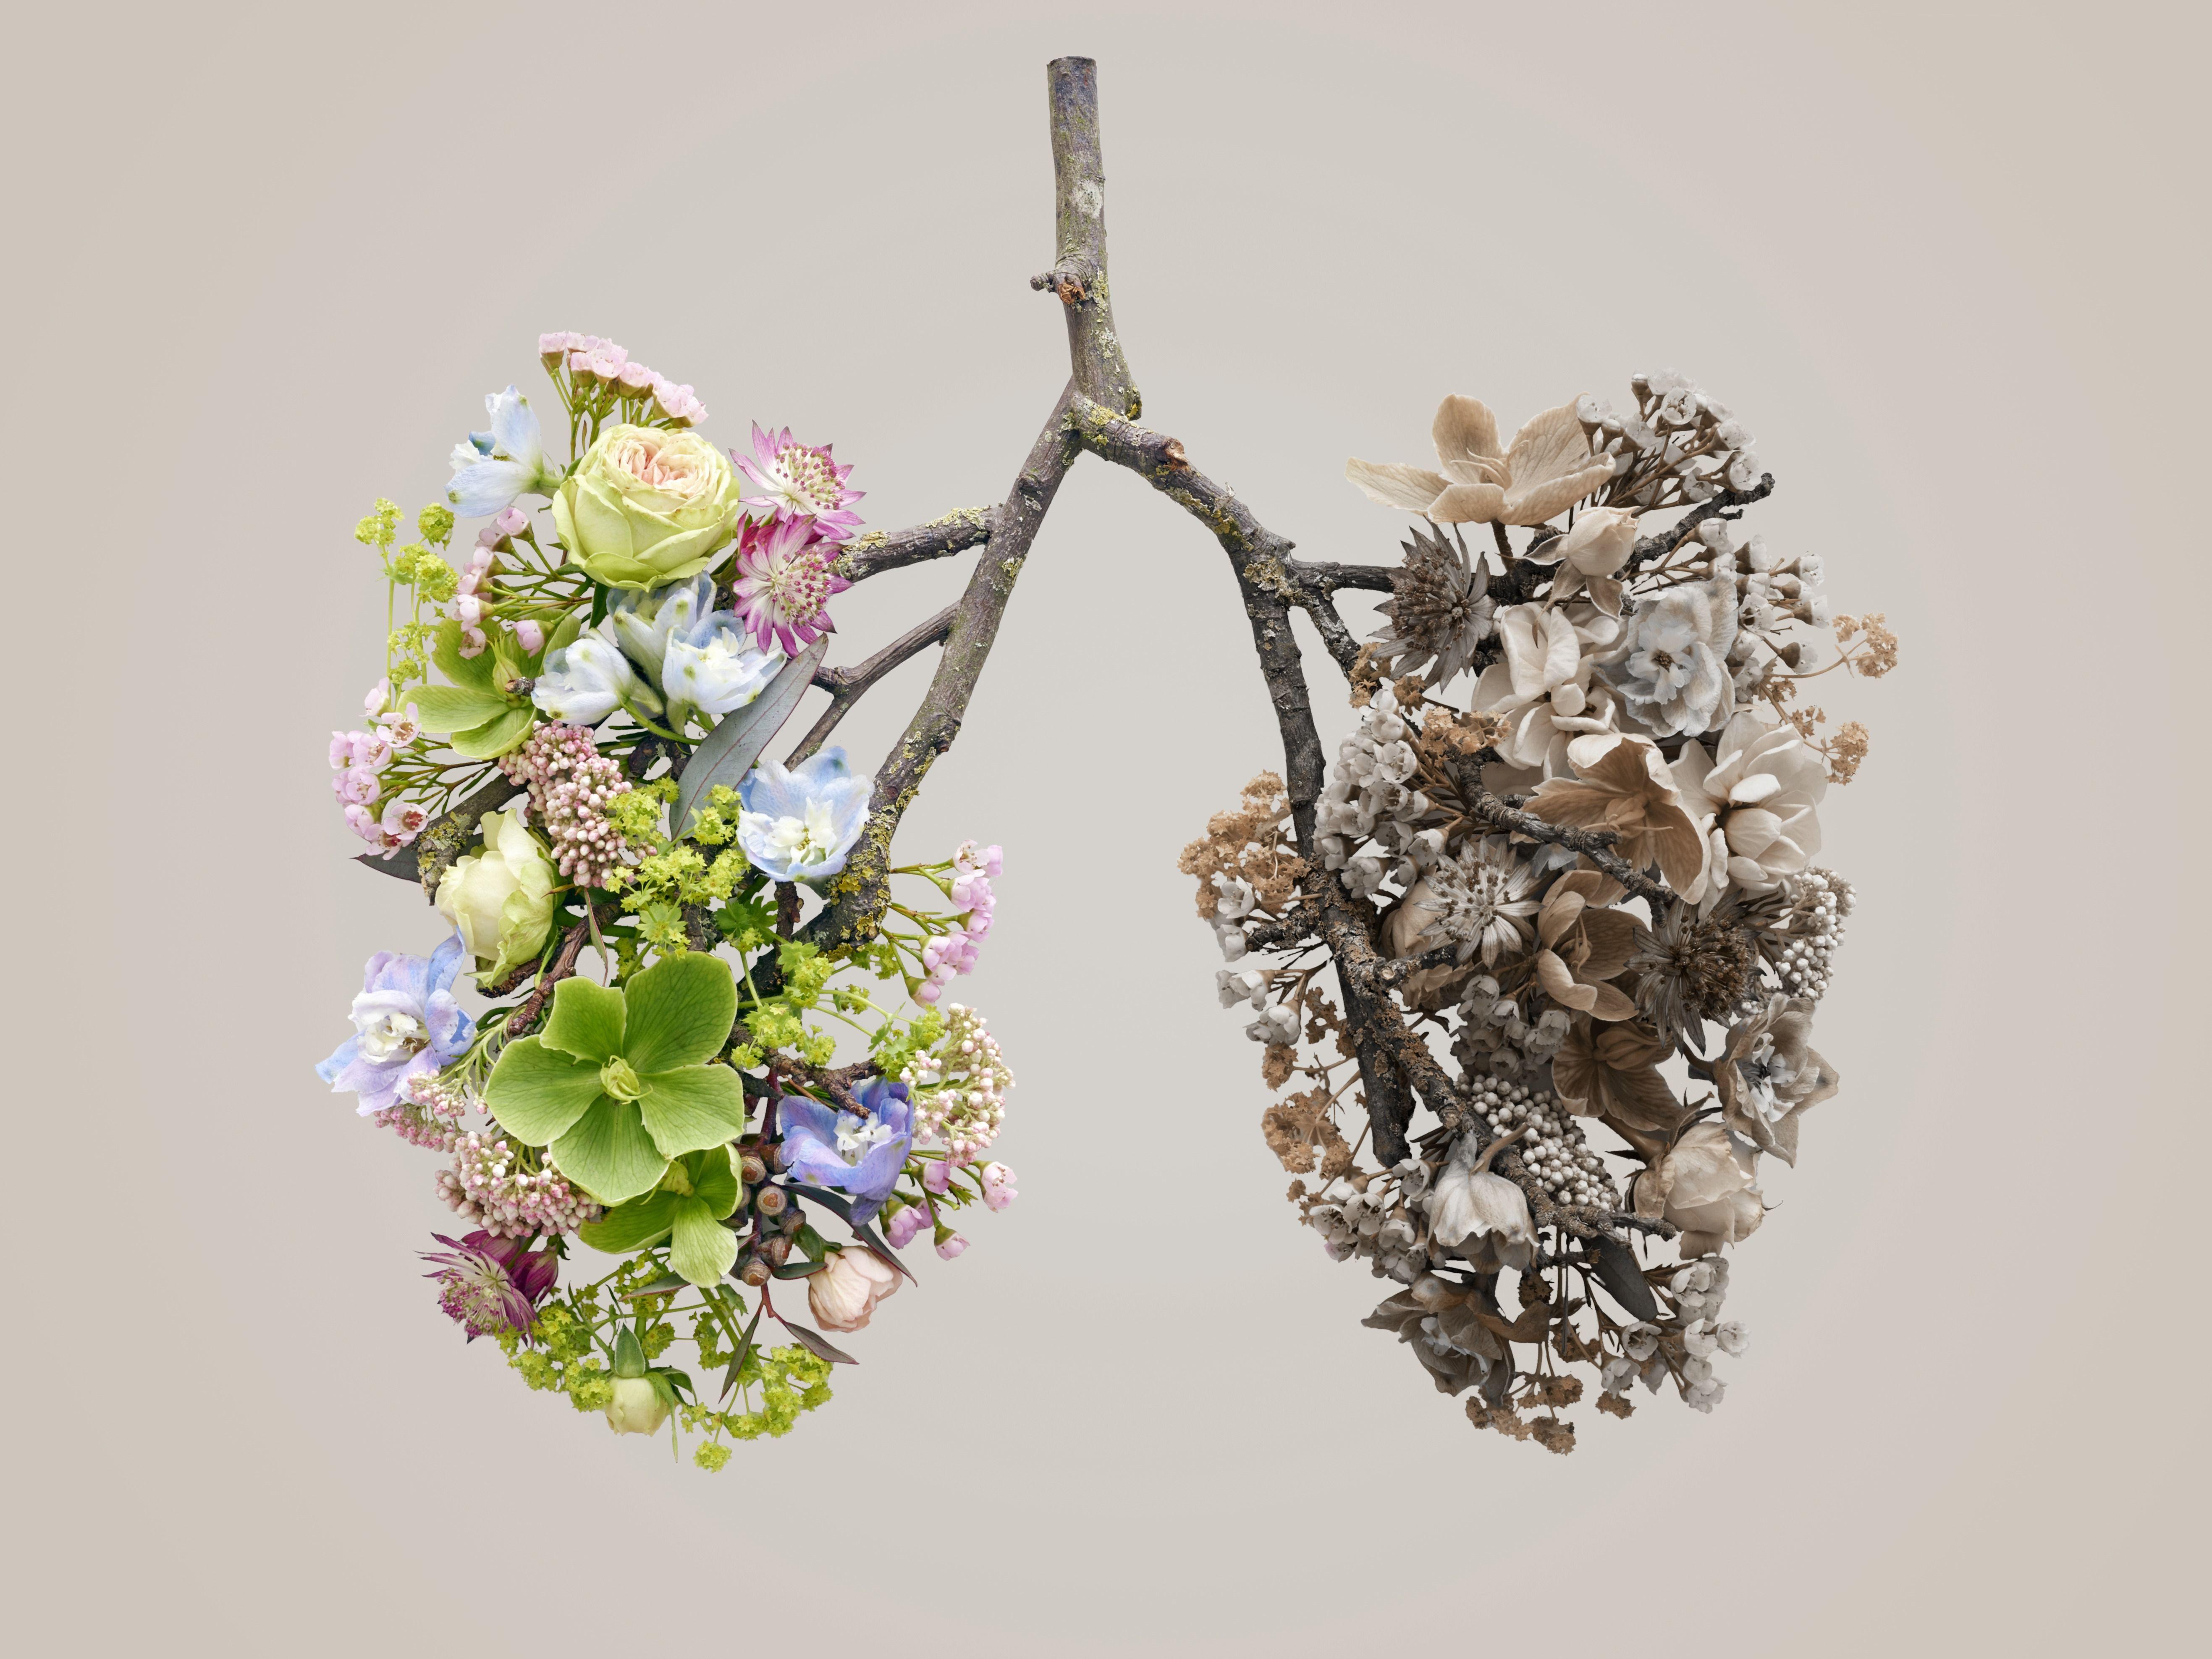 9 Lung Cancer Symptoms All Women Should Keep On Their Radar